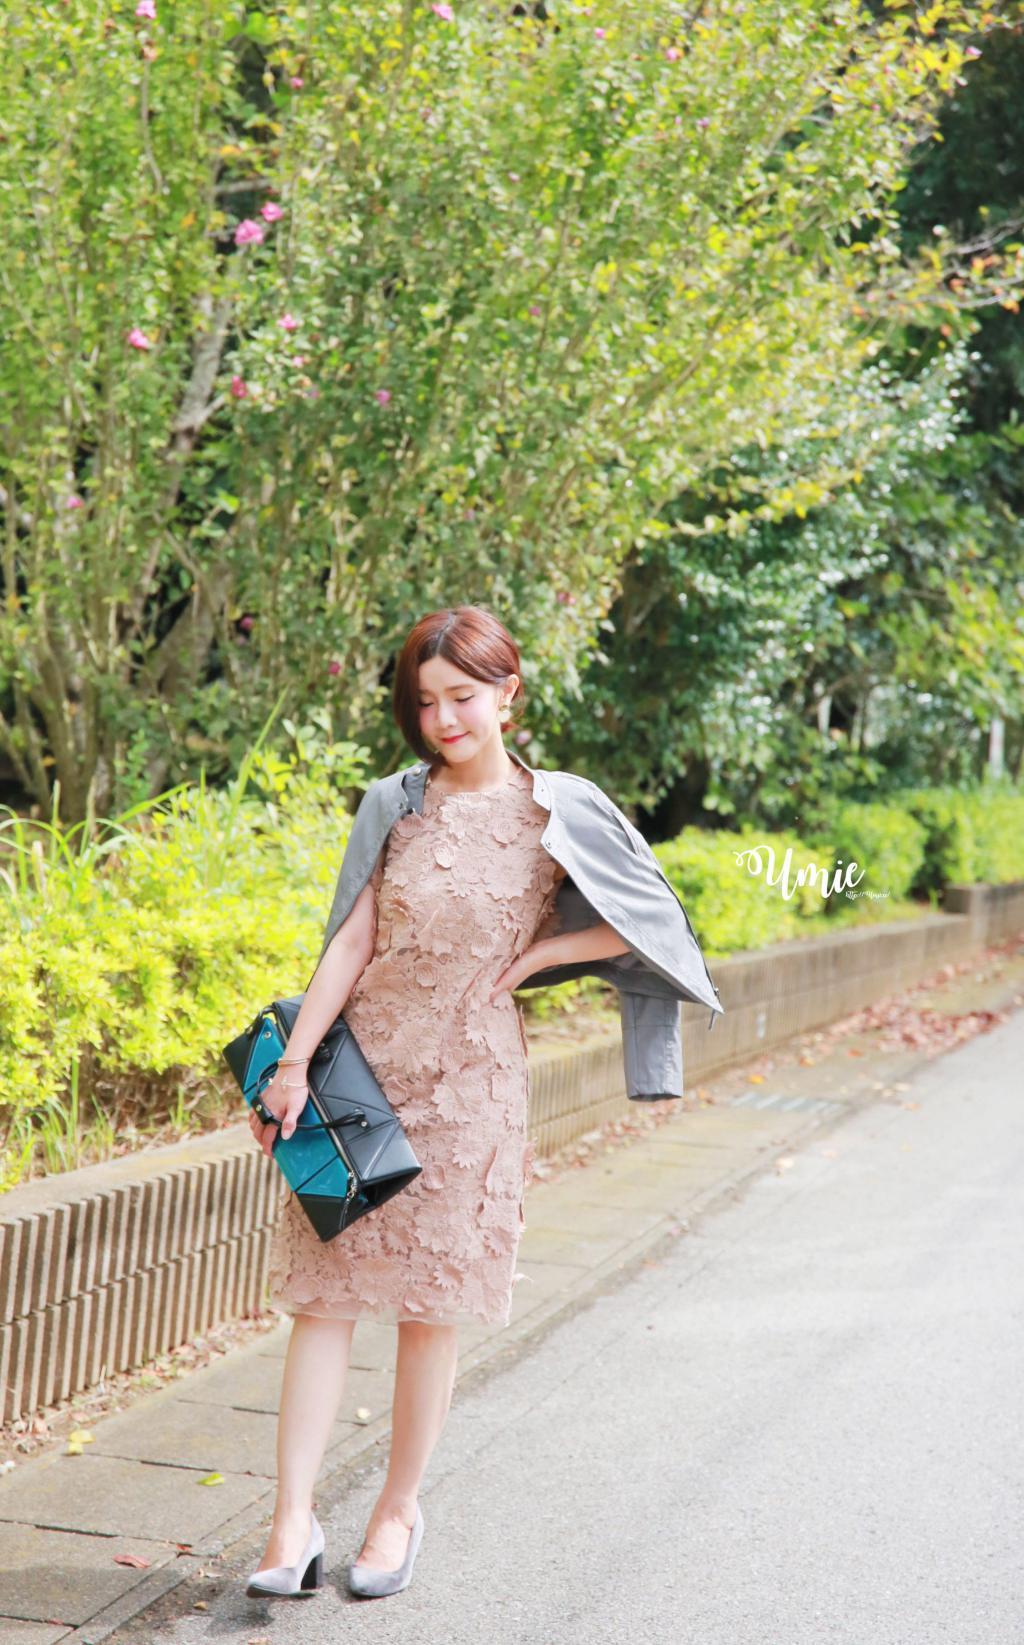 MIW 質感韓貨| Melody In Wonderland |秋季顯瘦穿搭 9 套分享,每一件單品都值得帶回家!